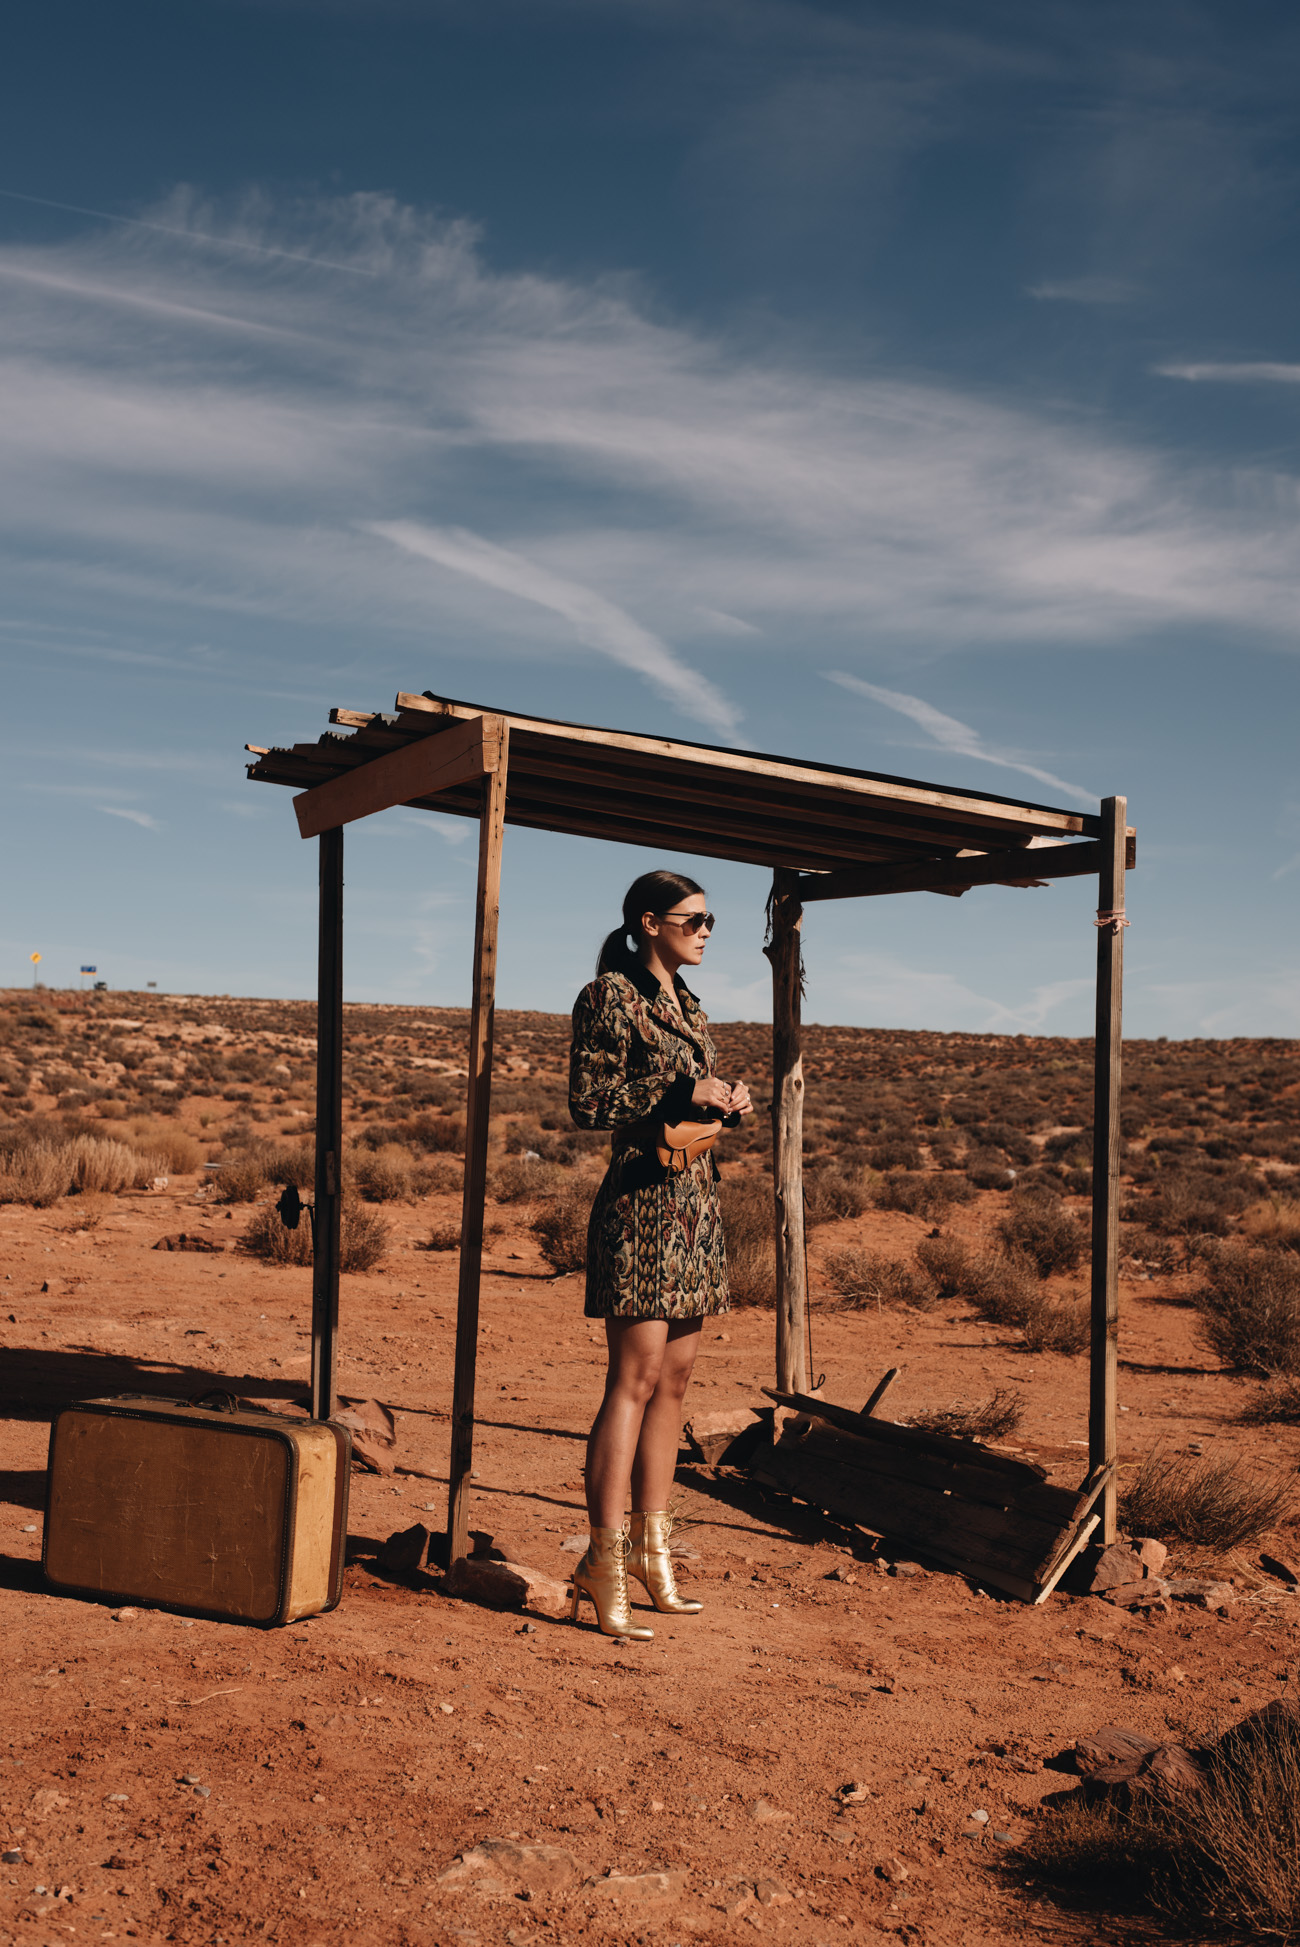 Fashion-Editorial-blogger-Foto-Shooting-Highway-Monument-Valley-Road-Trip-Koffer-Outdoor-location-nina-schwichtenberg-fashiioncarpet